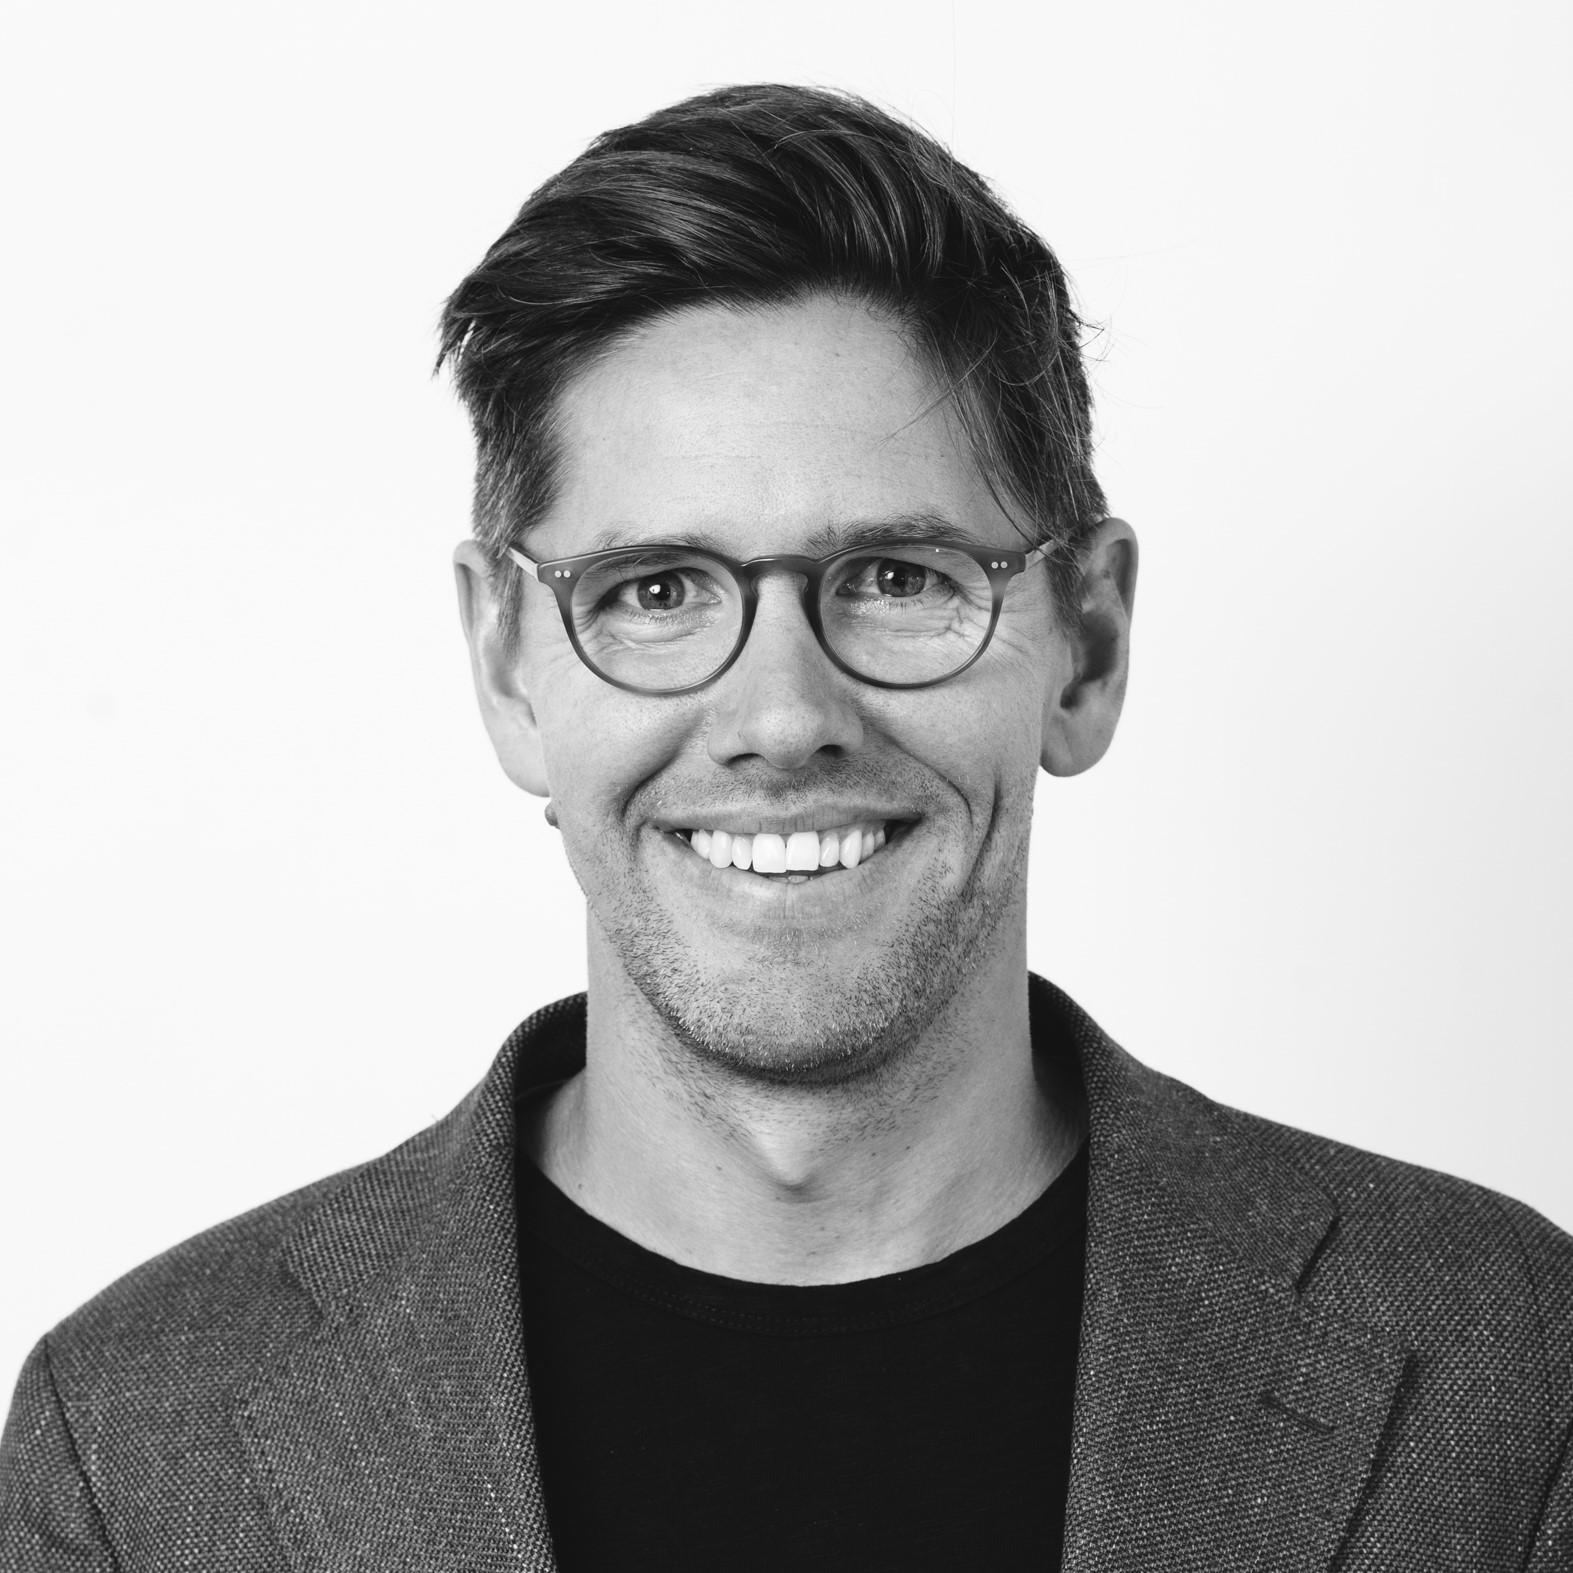 Hugo Leichsenring